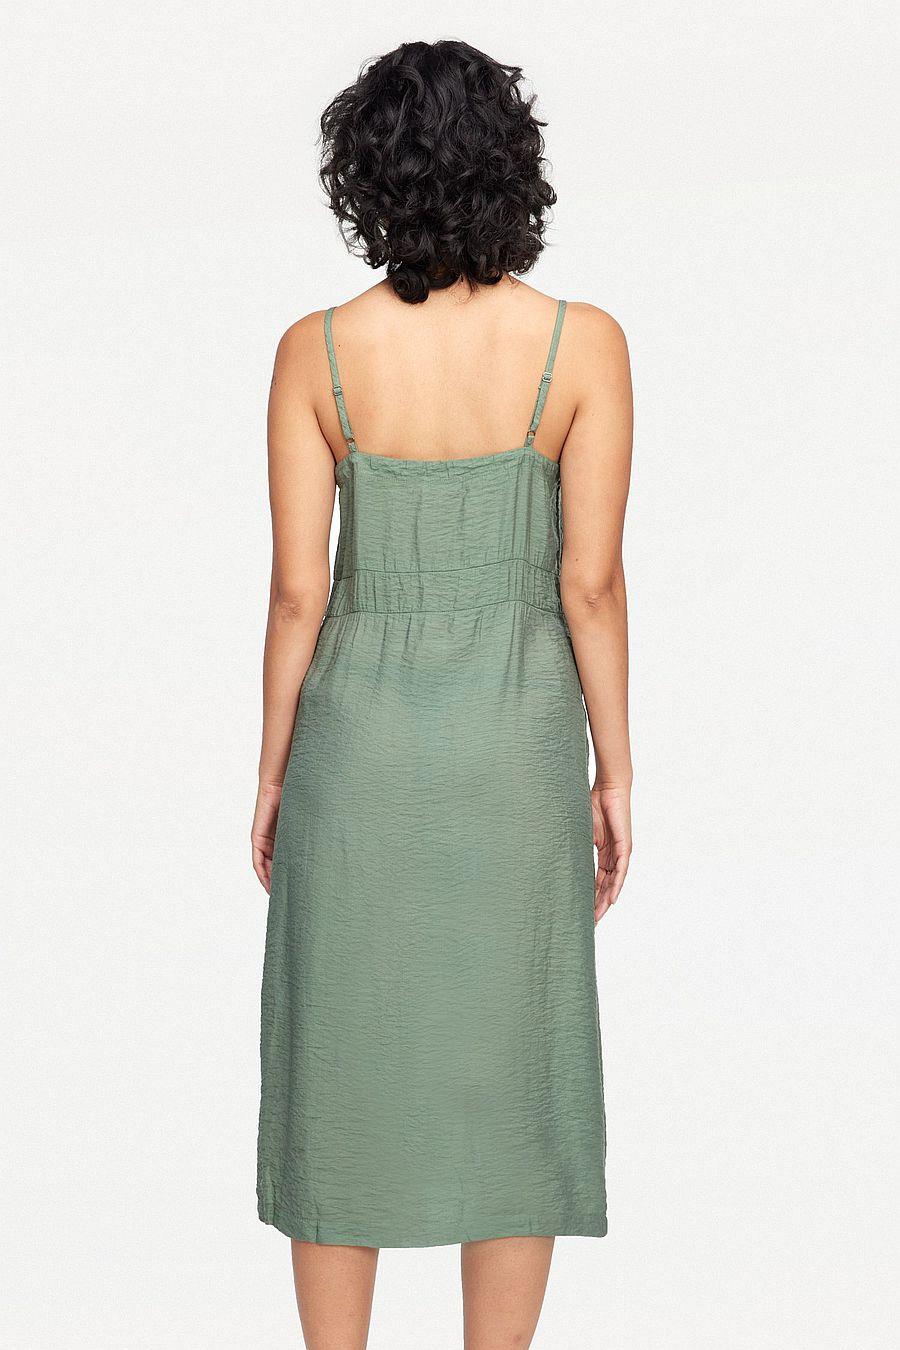 LACAUSA Clothing Alma Slip Dress - Seaweed